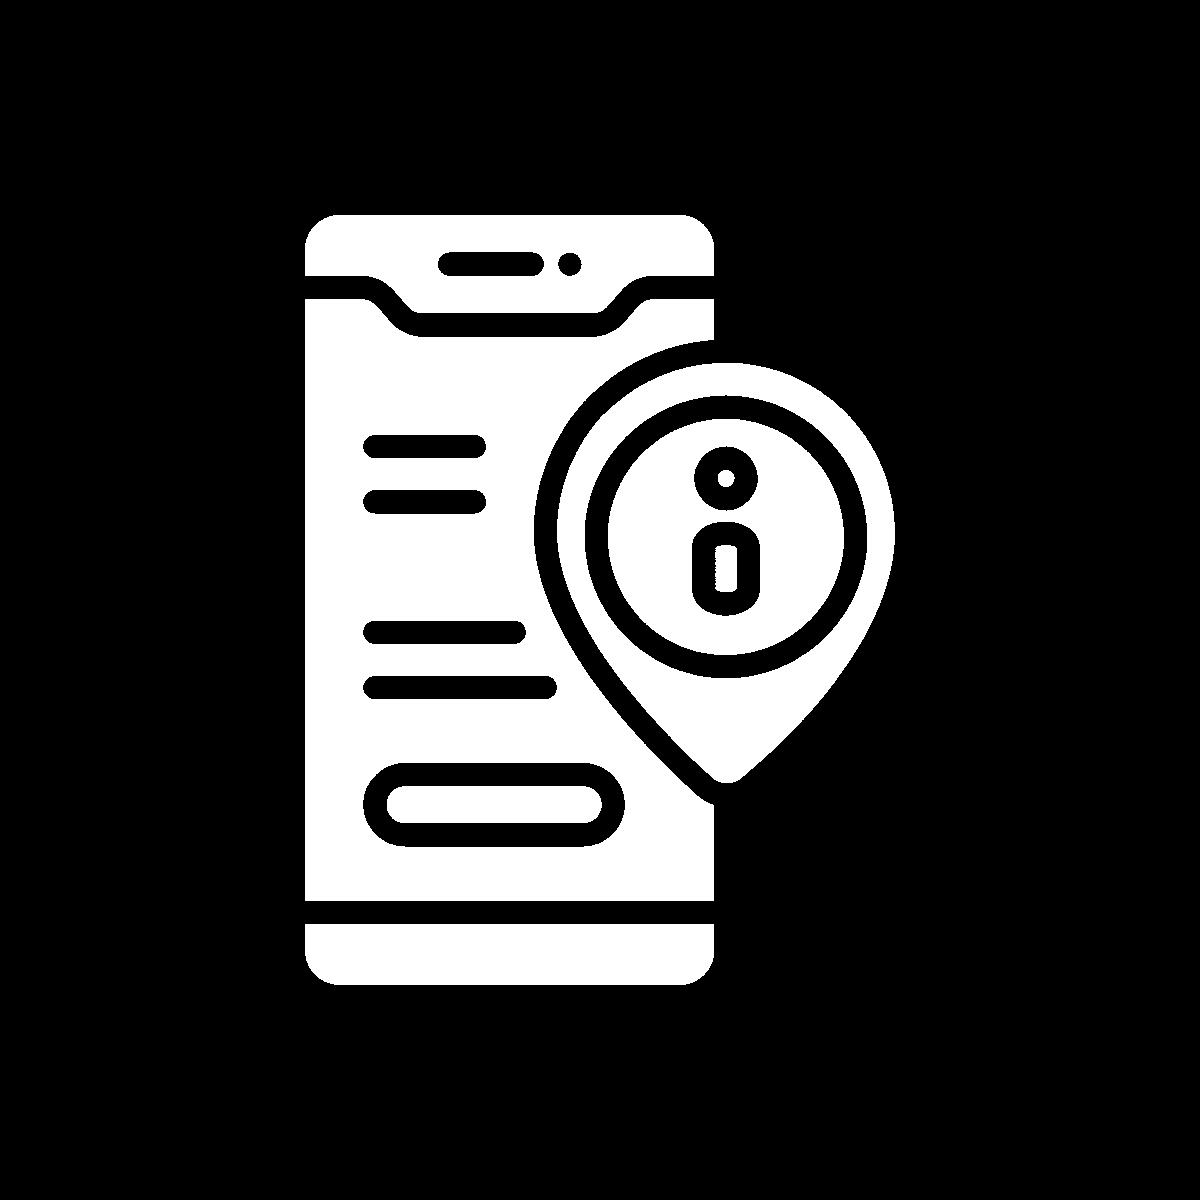 info-icon-2